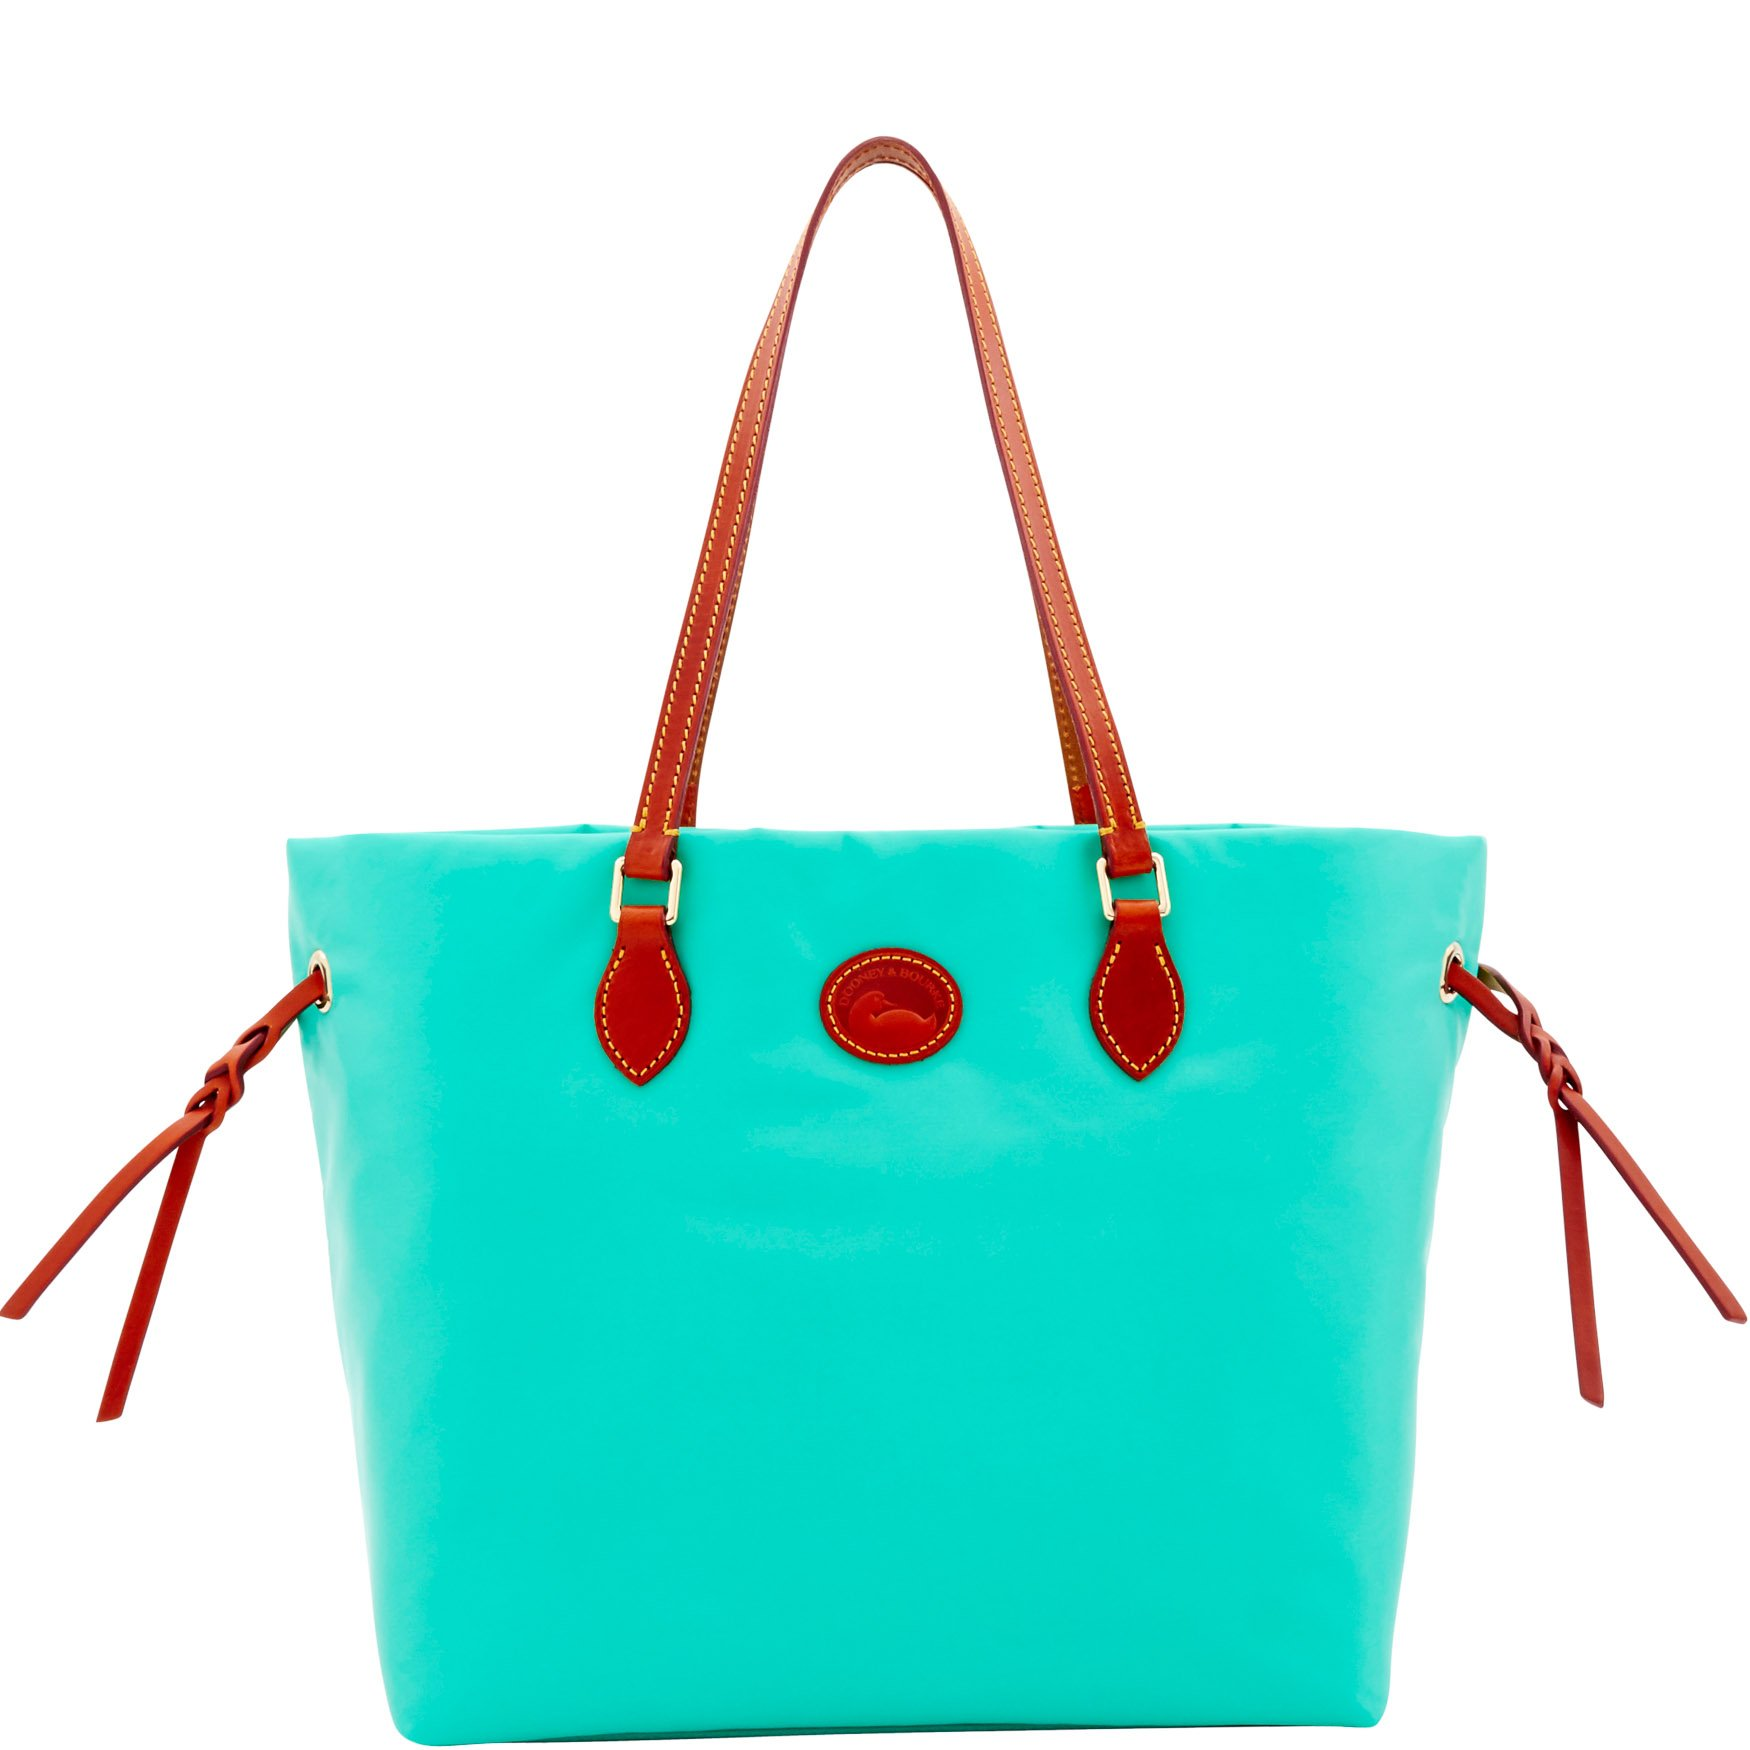 Dooney & Bourke Nylon Shopper Tote Shoulder Bag Purse, Green by Dooney & Bourke